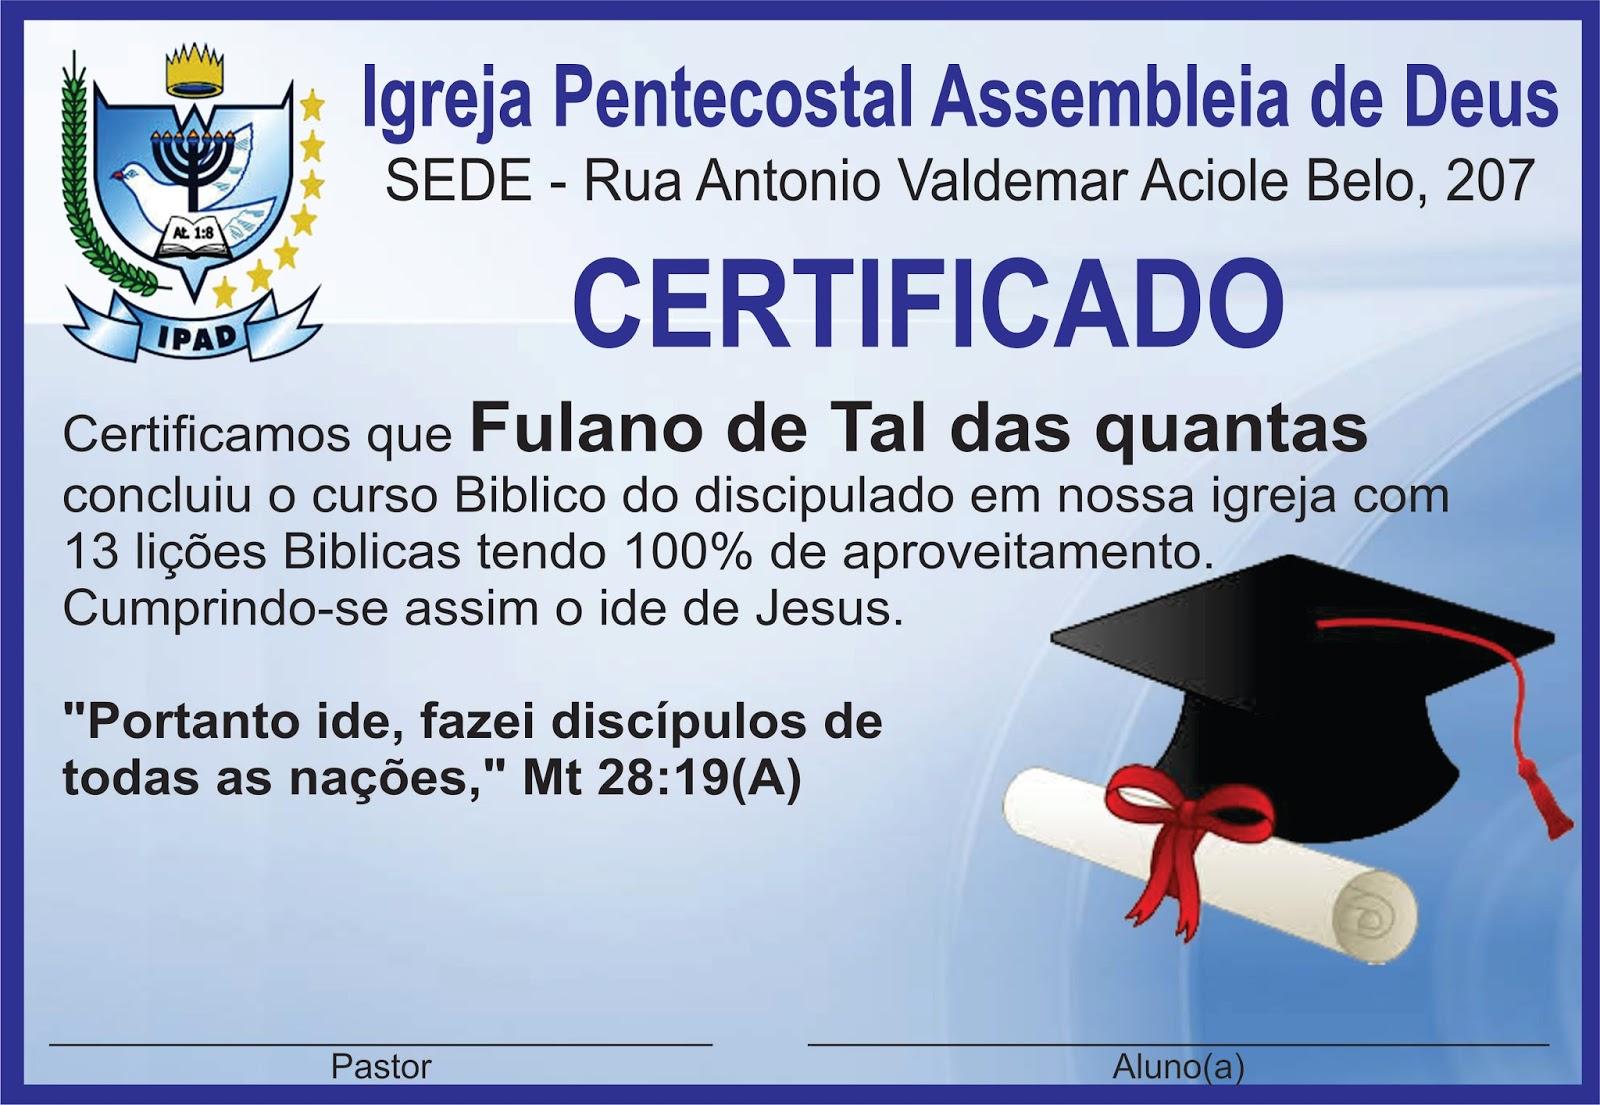 Suficiente MODELO DE CERTIFICADO DE DISCIPULADO EDITAVEL DISPONIVEL PARA  BW06